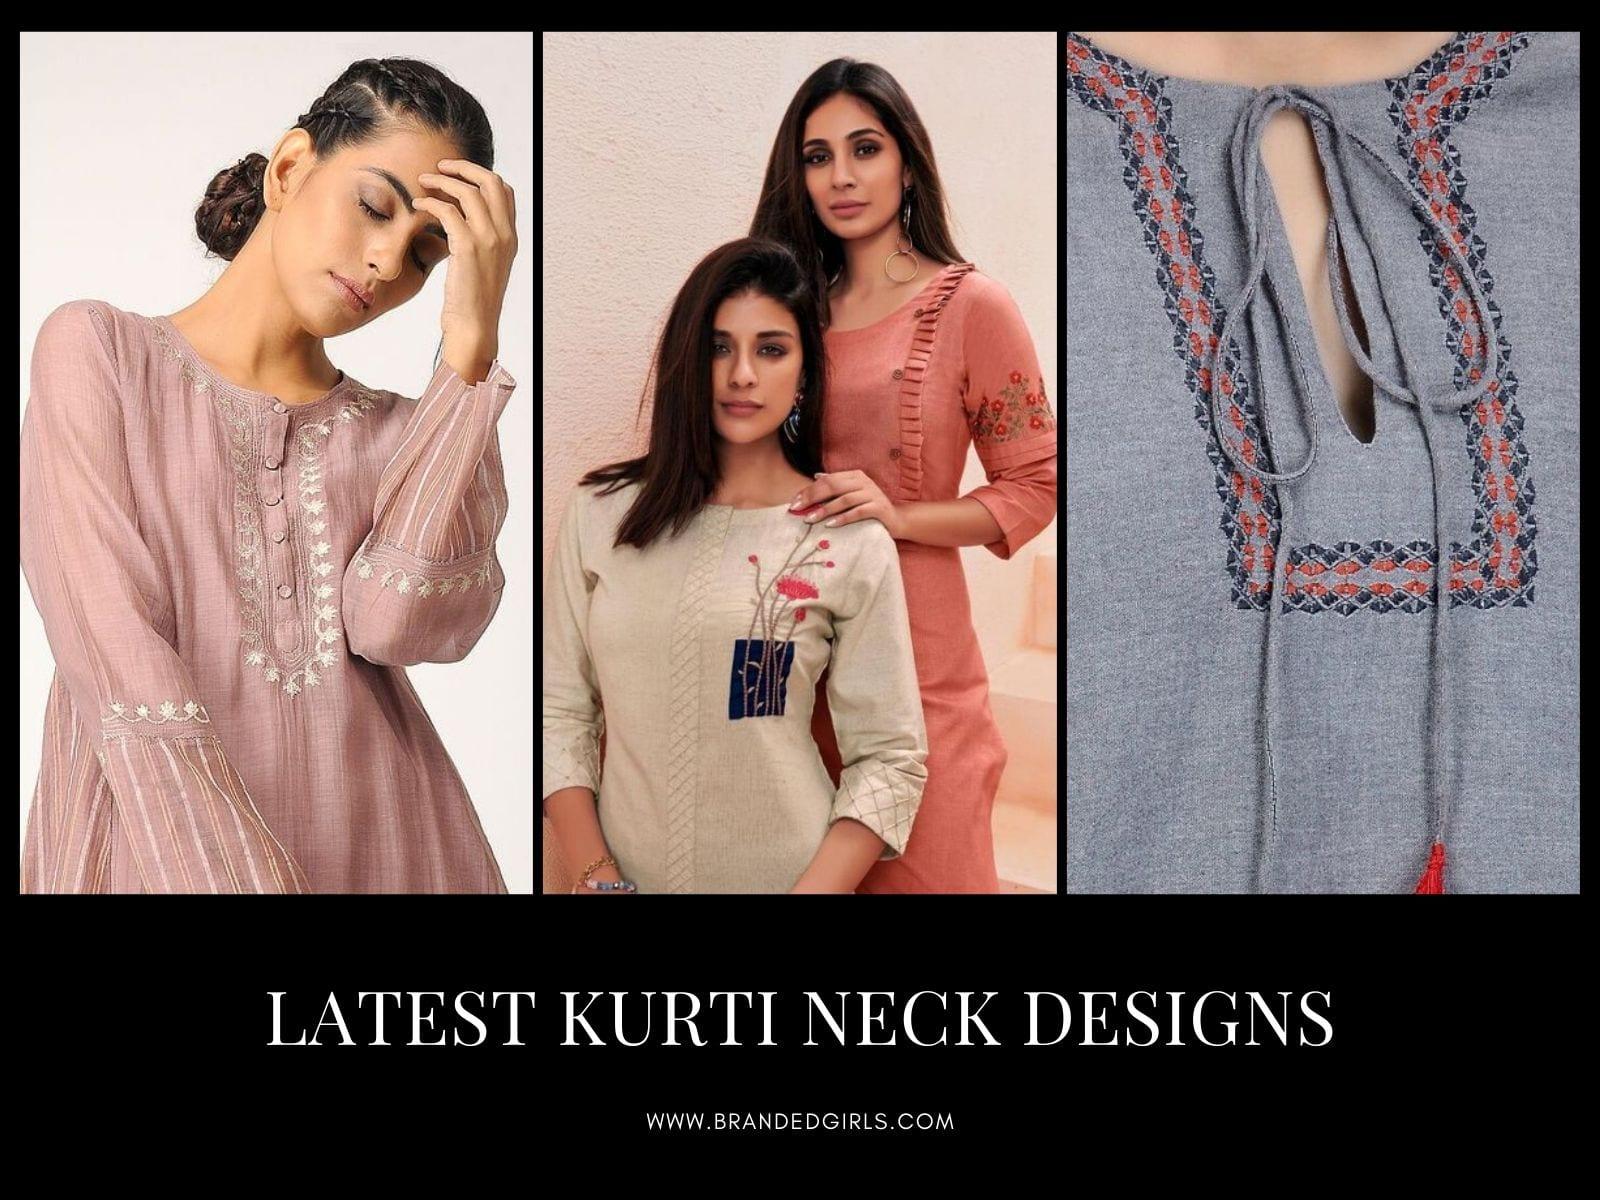 Kurti Neck Designs23 Latest Neck Styles for Kurtis In 2021